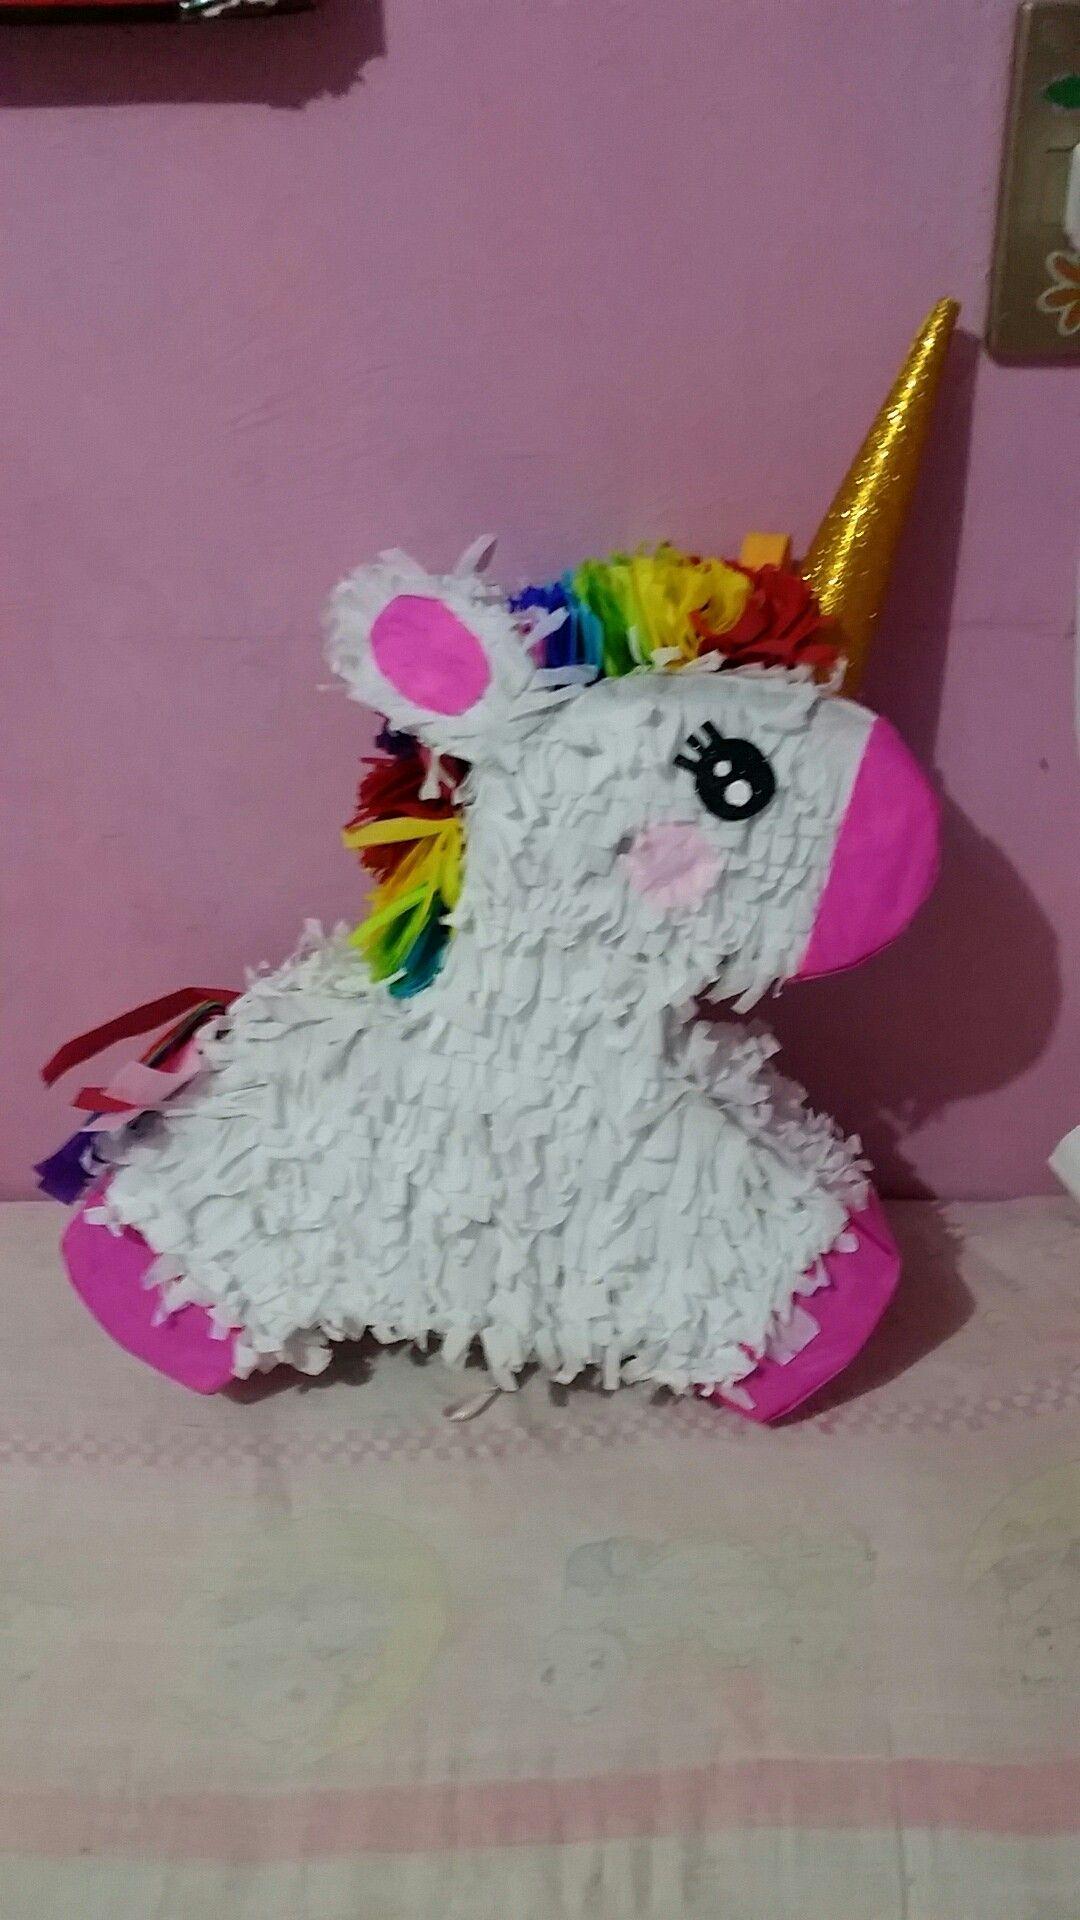 Pi ata de unicornio kawaii cumplea os pinterest pi ata de unicornio pi atas de y pi atas - Pinatas de cumpleanos ...